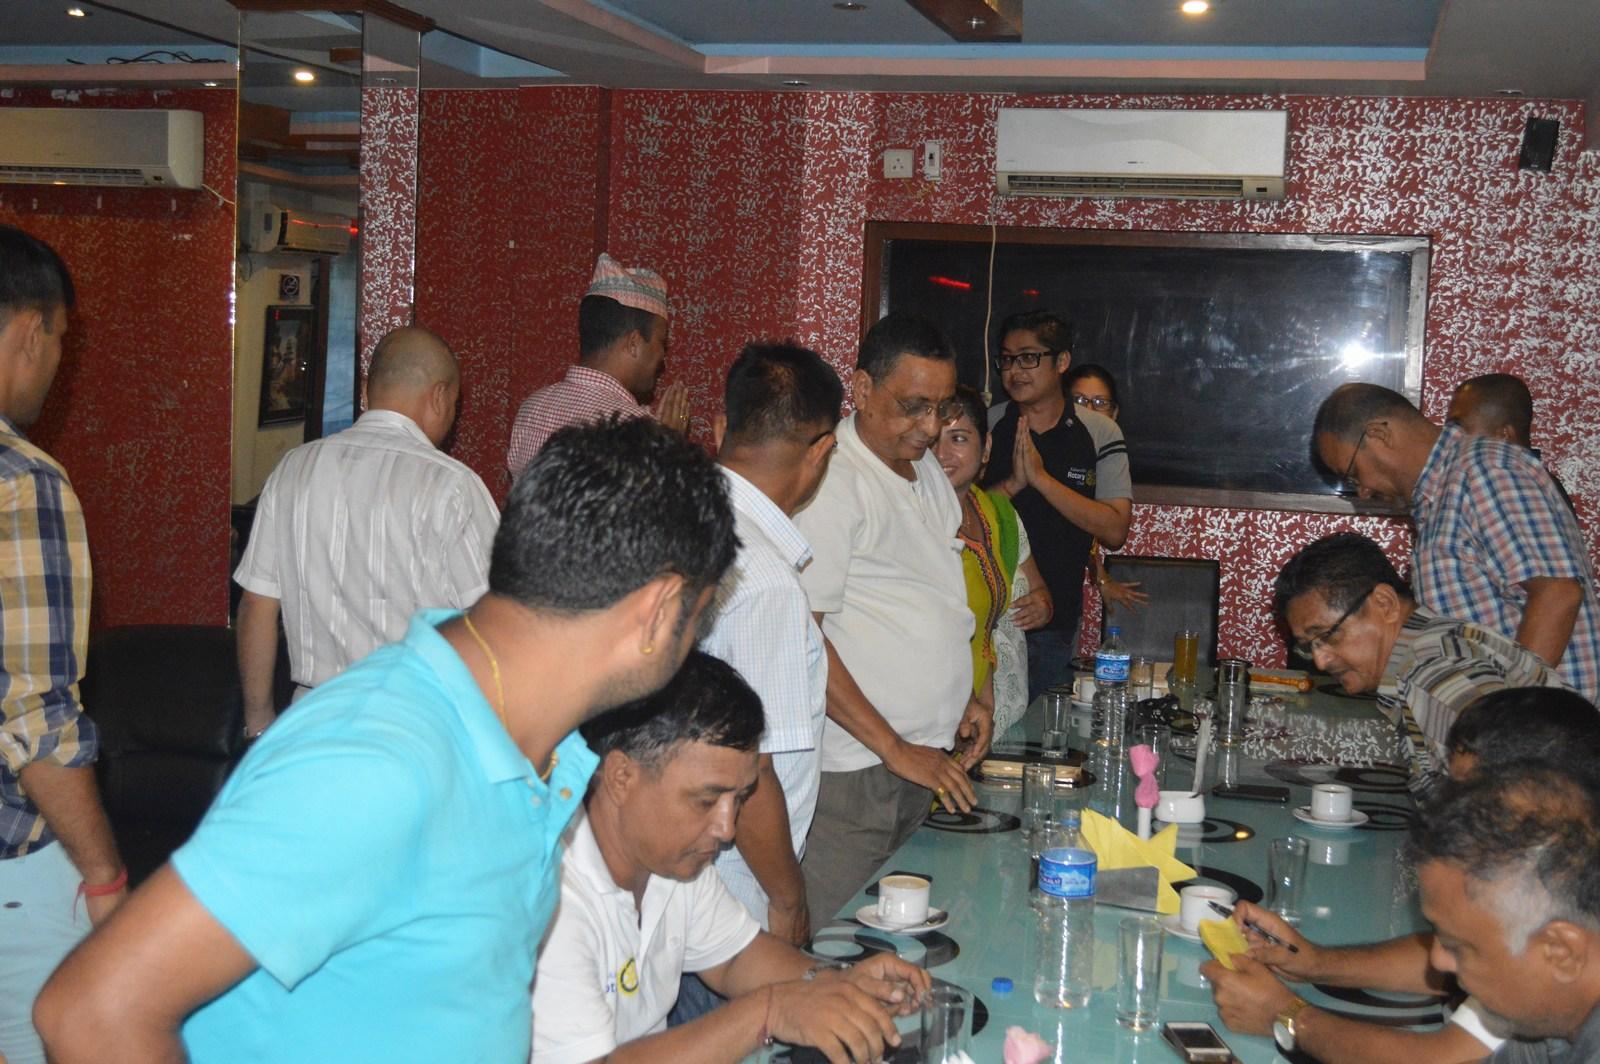 Weekly-Meeting-with-the-Guest-Speaker-DSP-Durga-Raj-Regmi-Rotary-Club-of-Kakarvitta-5